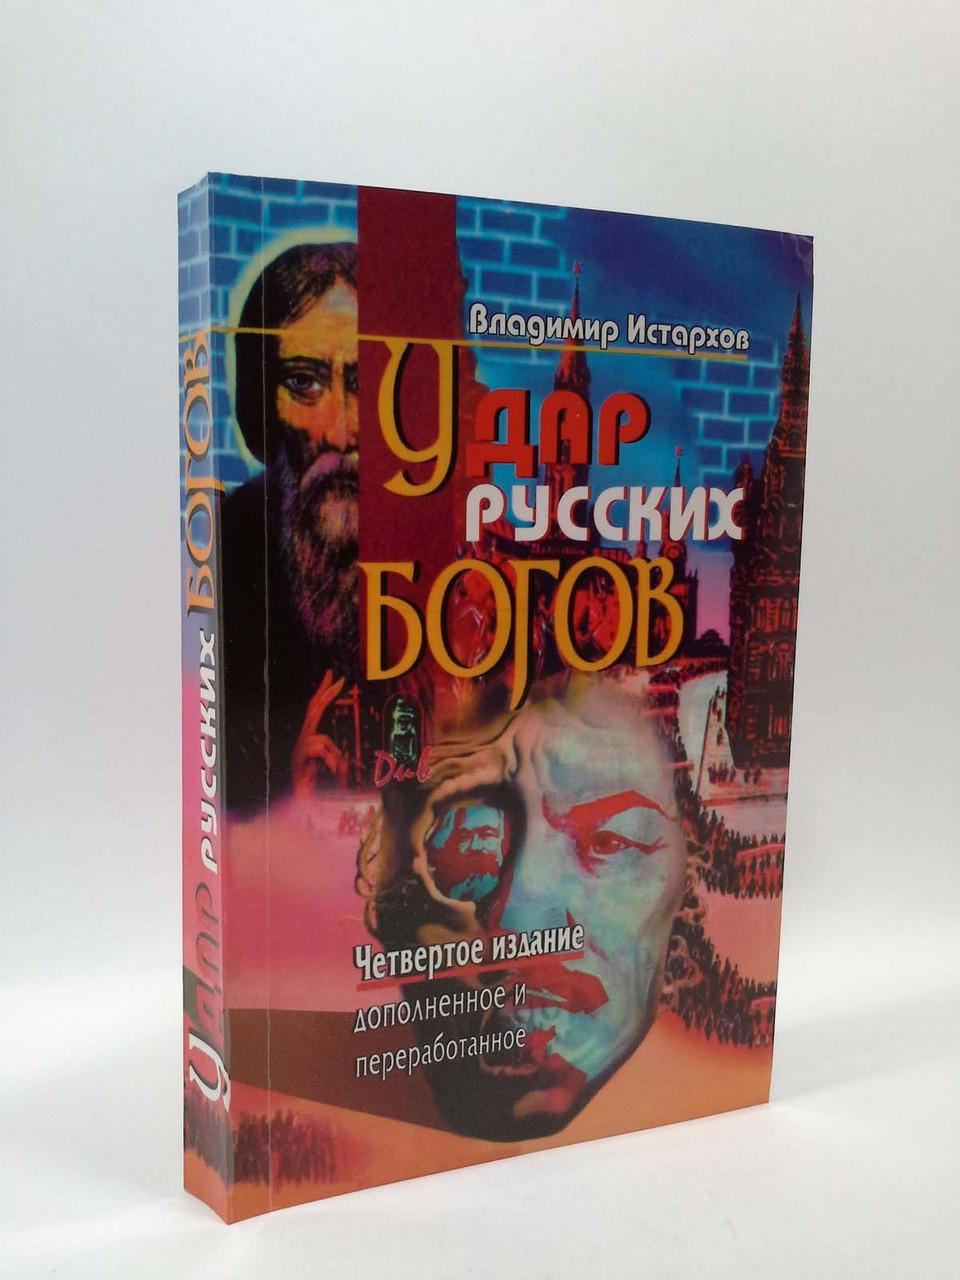 Удар русских богов. Владимир Истархов. Свитовид